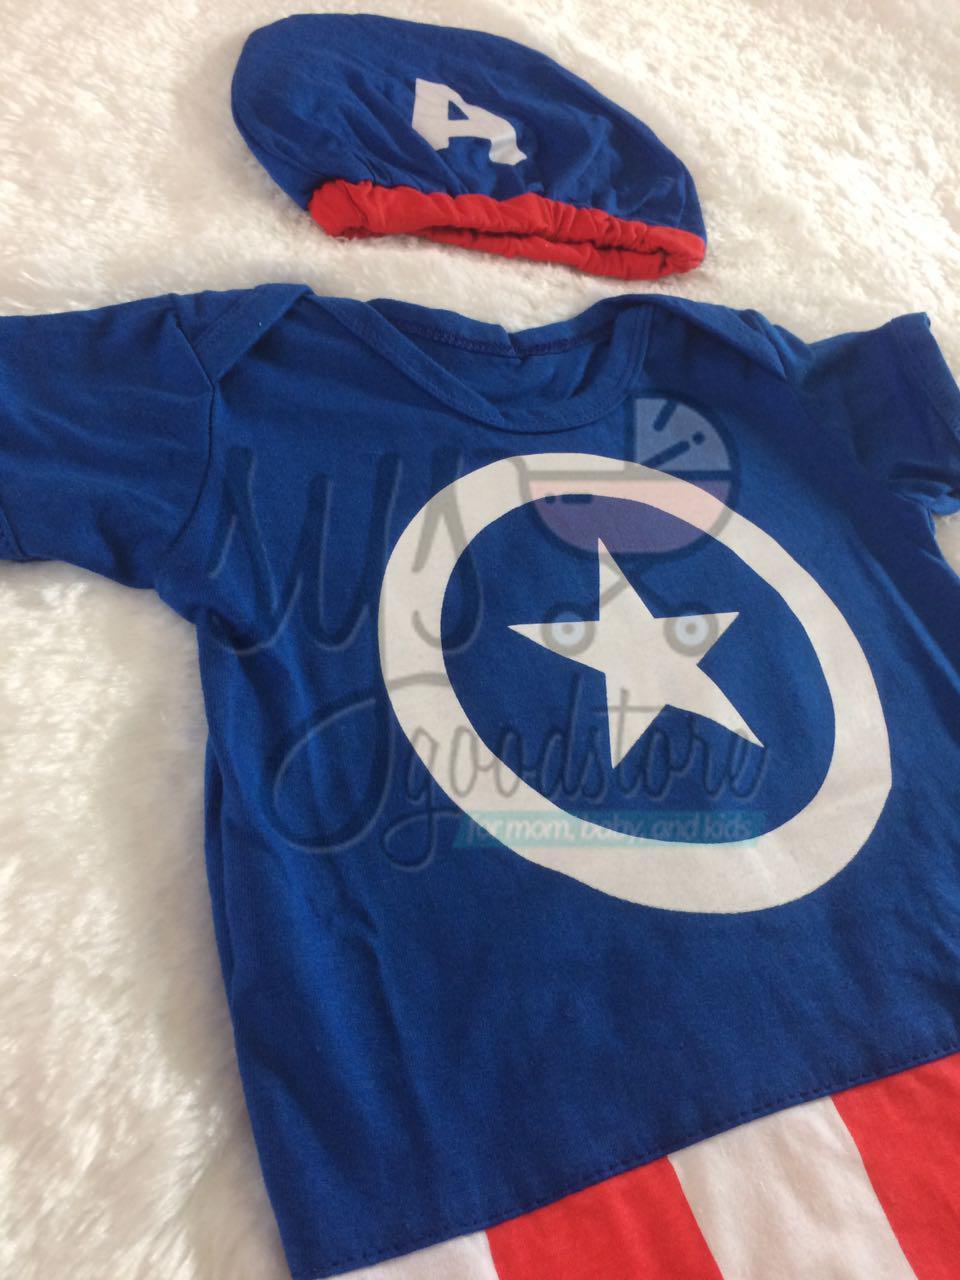 Fitur Sysgoodstore Jumper Bayi Captain America New Version Good Baju Karakter Detail Gambar Quality Laki